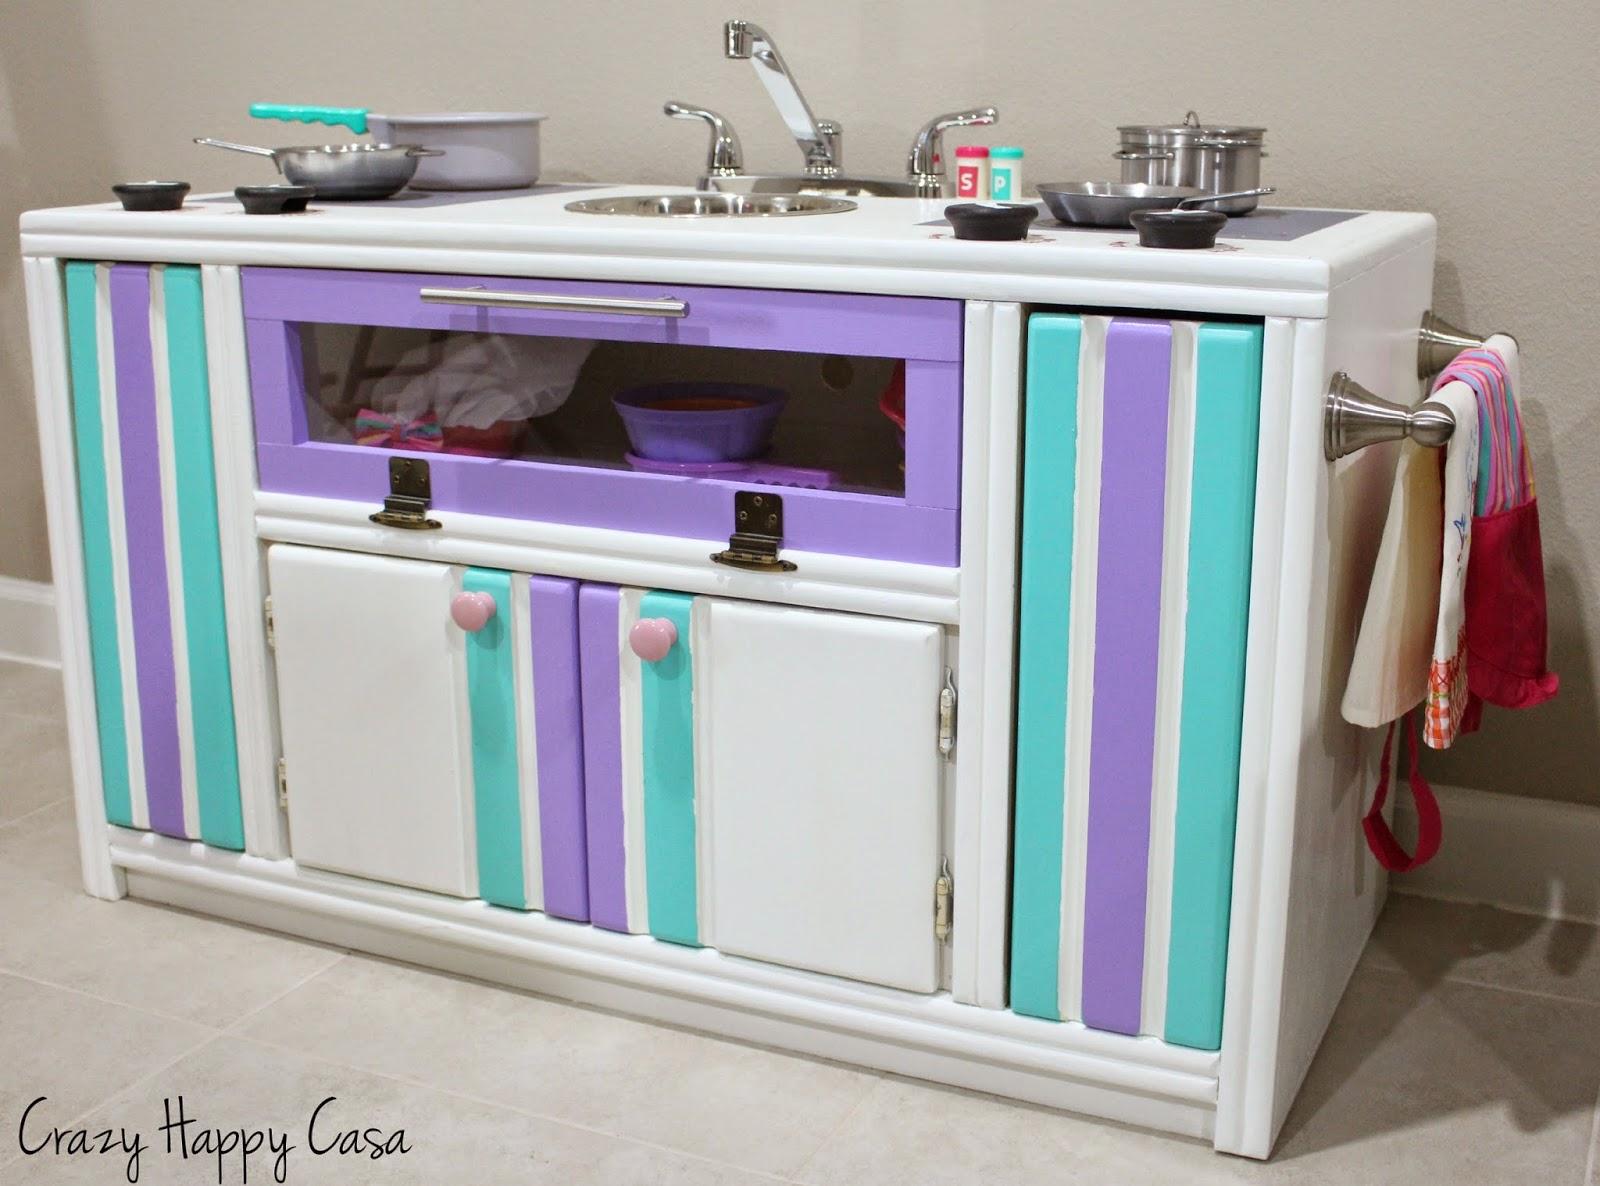 Play Kitchen | Crazy Happy Casa